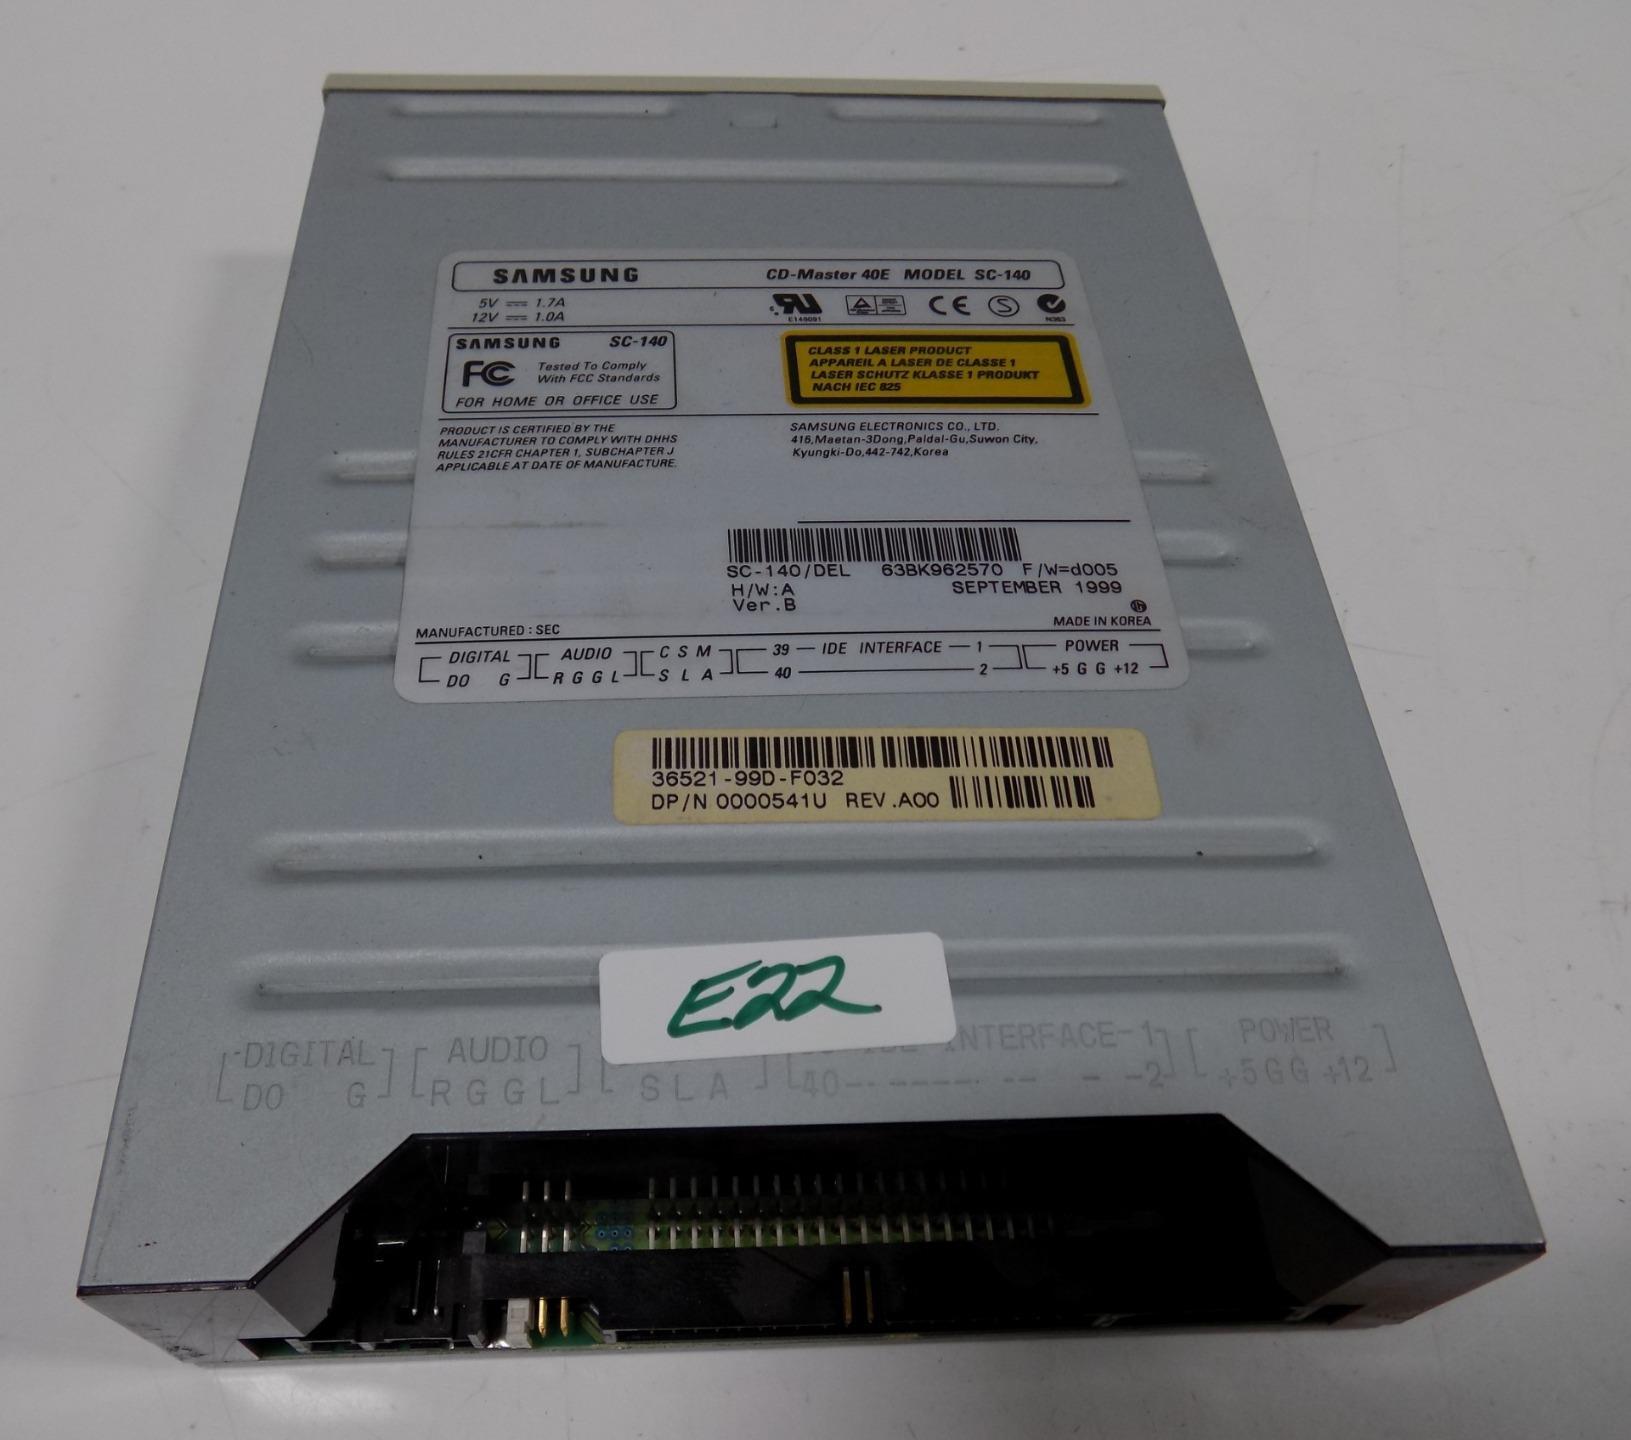 samsung cd master disc drive 40e sc 140 ebay rh ebay com